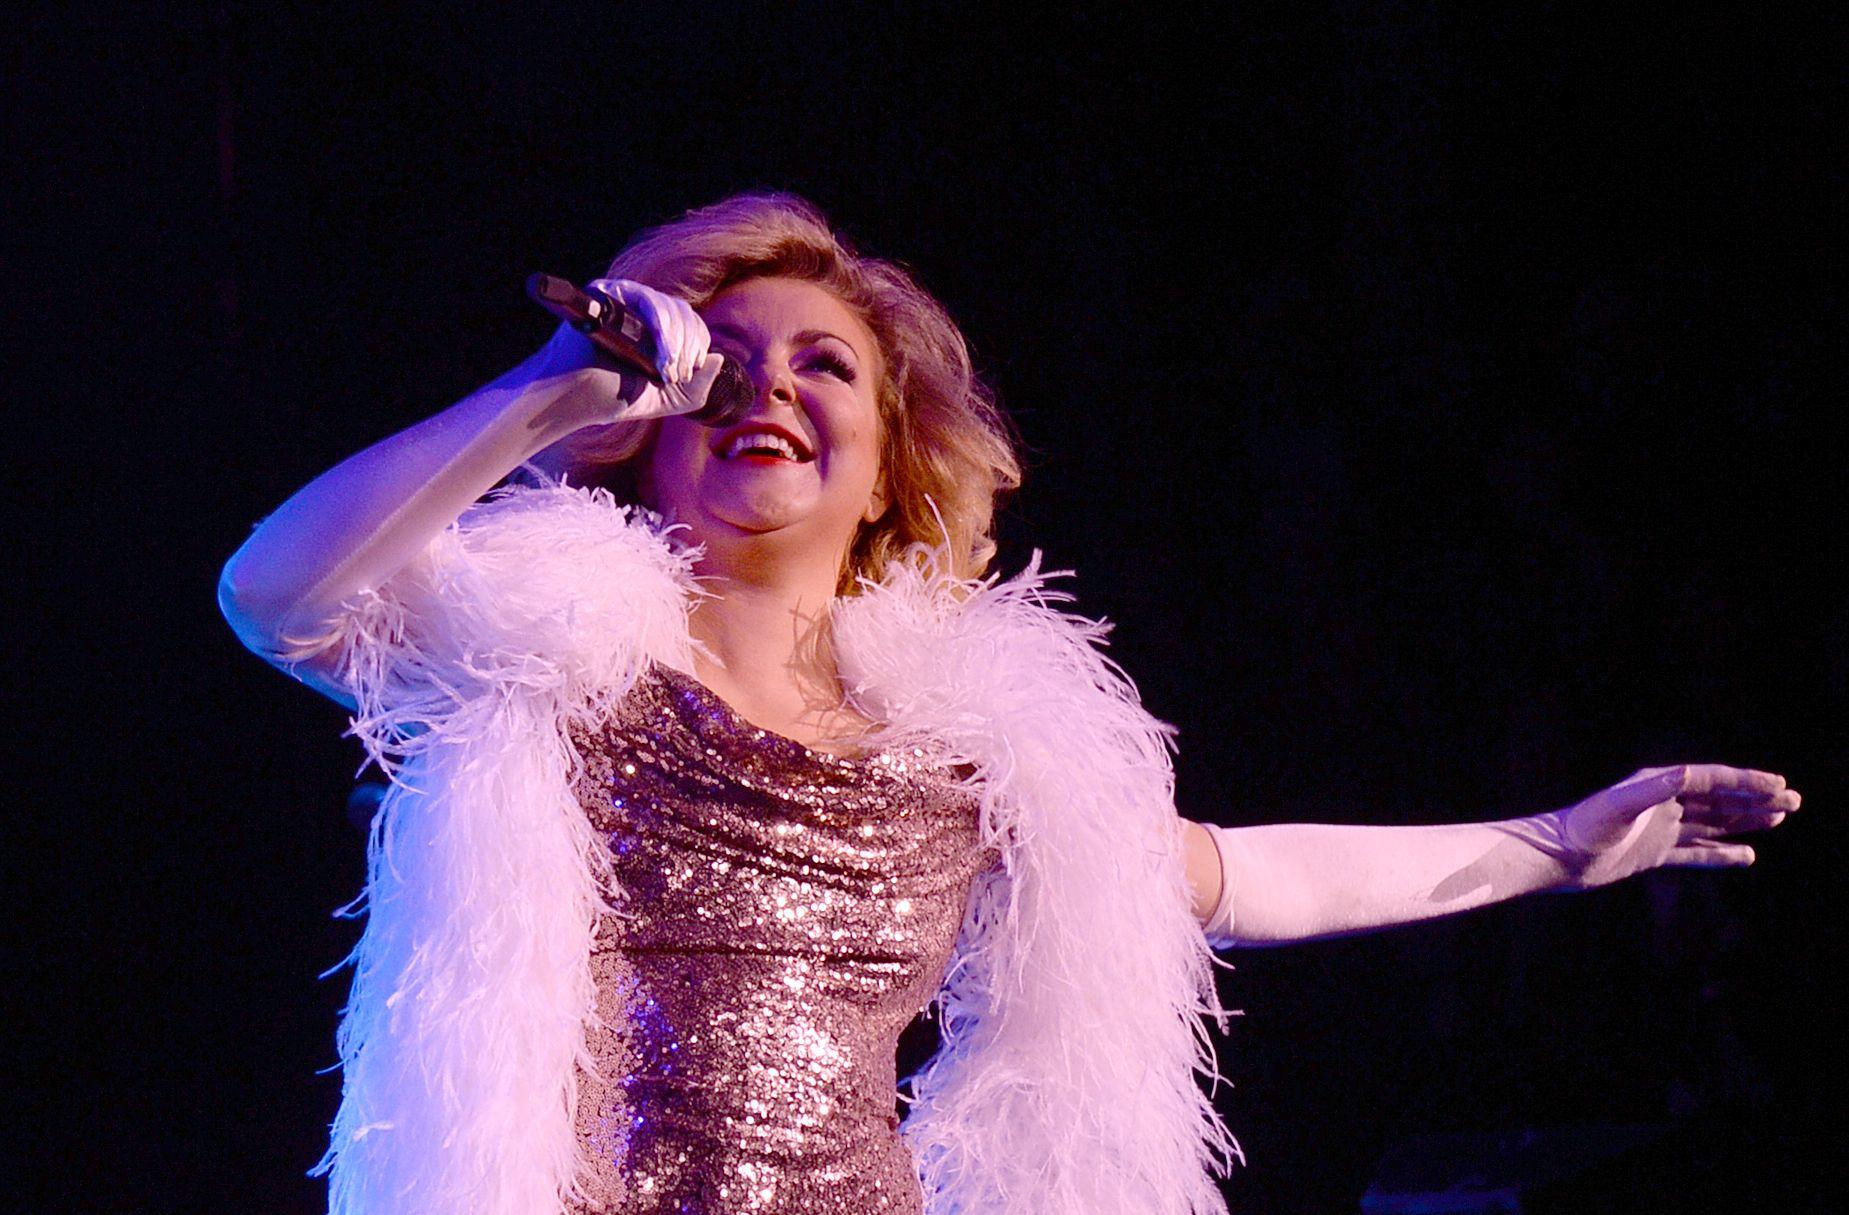 Amanda Steadman sheridan smith & alison steadman to star in jimmy mcgovern's